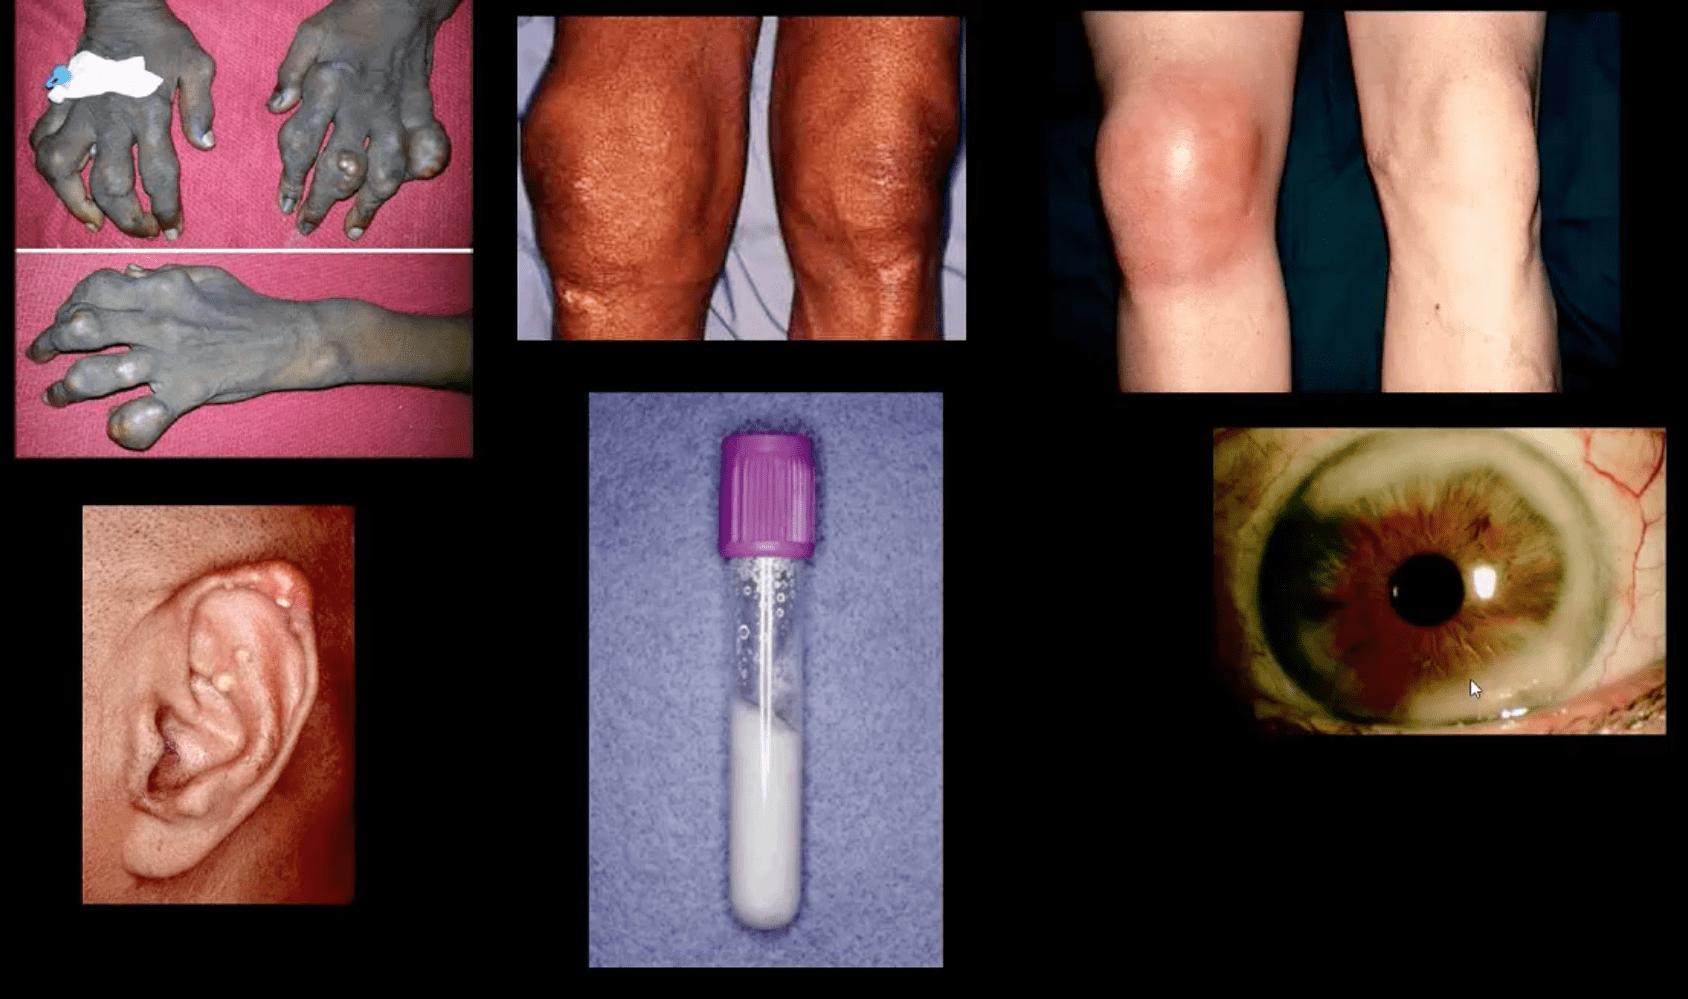 joelho artrite quiropraxia el paso tx.